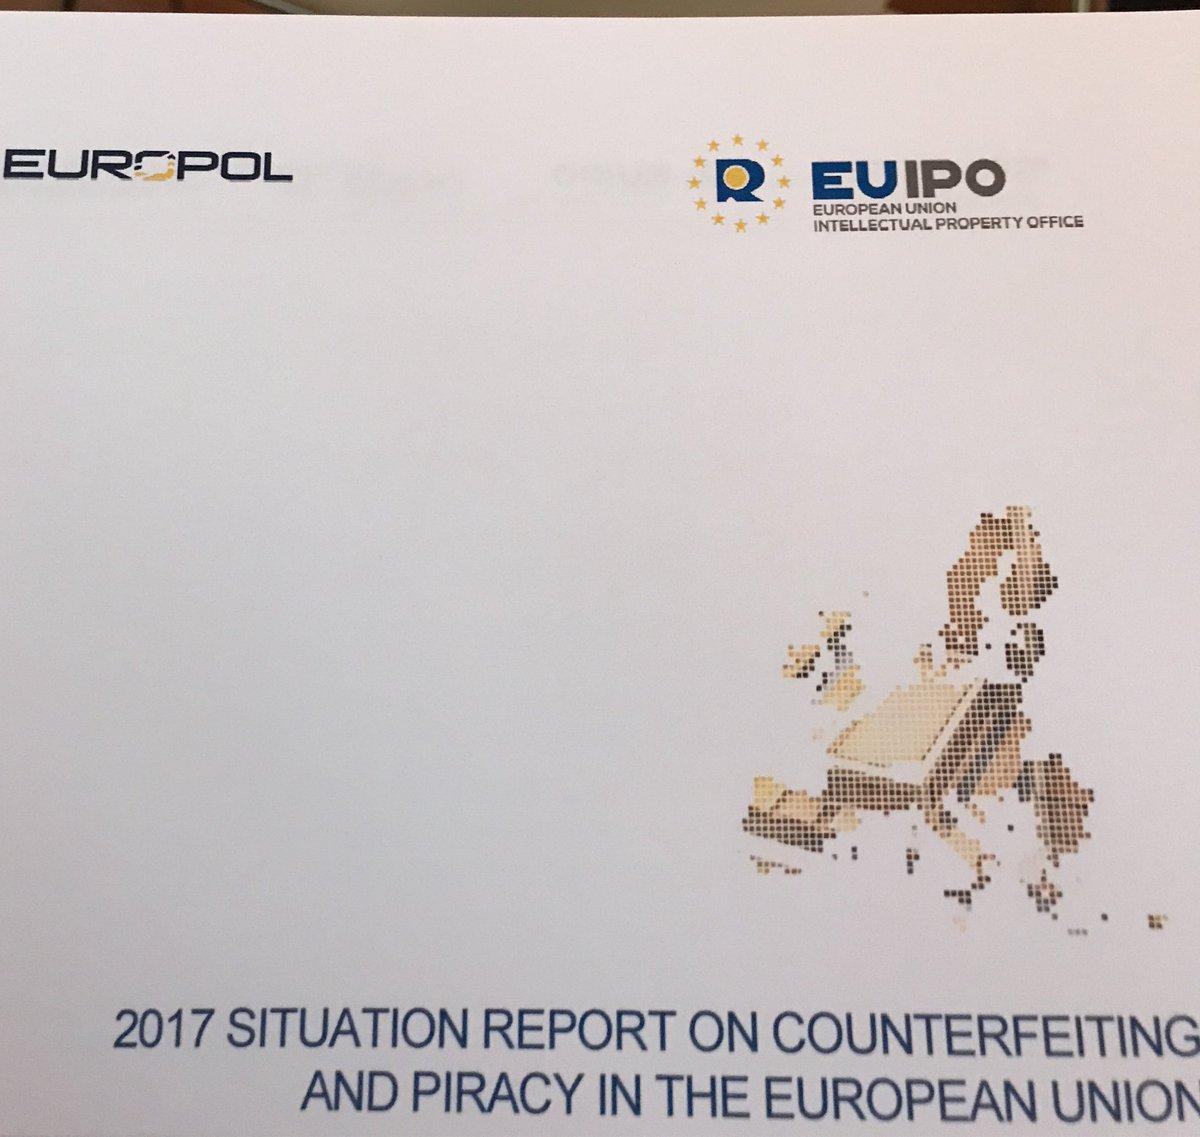 test Twitter Media - Great start of #IPSummit17 in Berlin. Hot report on counterfeiting in the Eu https://t.co/Sxk7cjvFEk